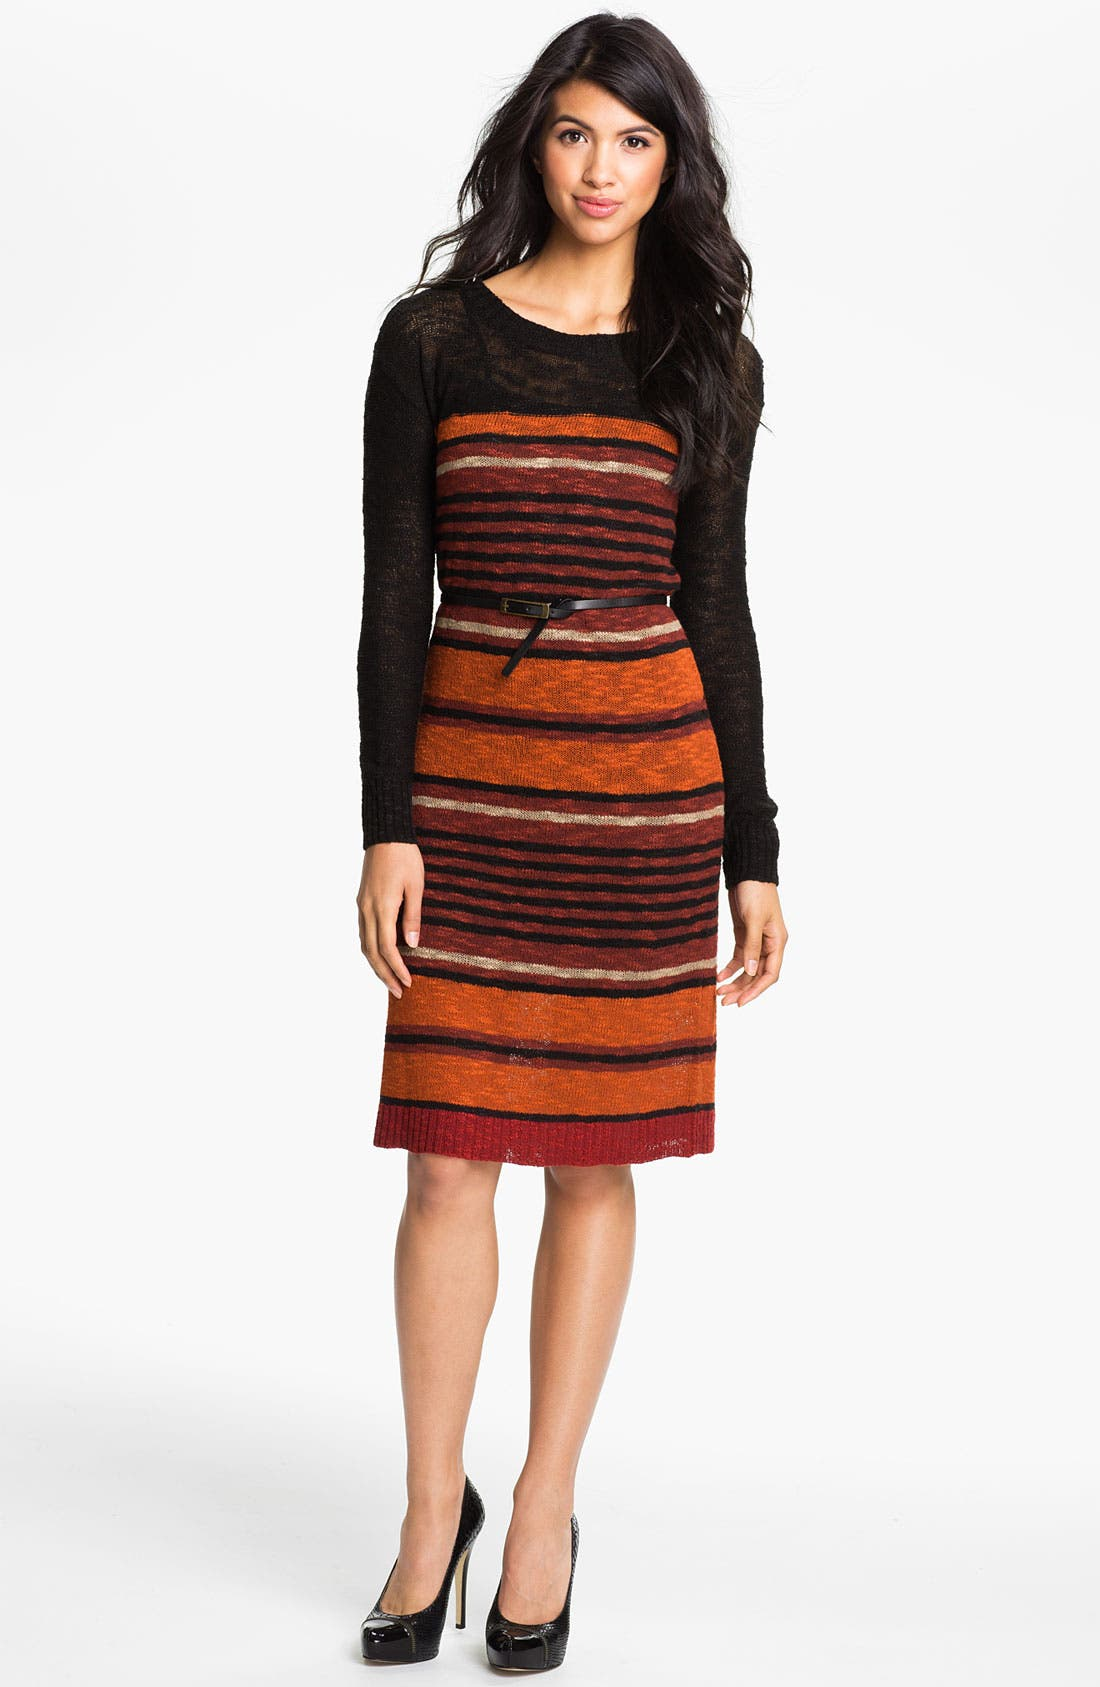 Alternate Image 1 Selected - Kensie Belted Sweater Dress (Online Exclusive)